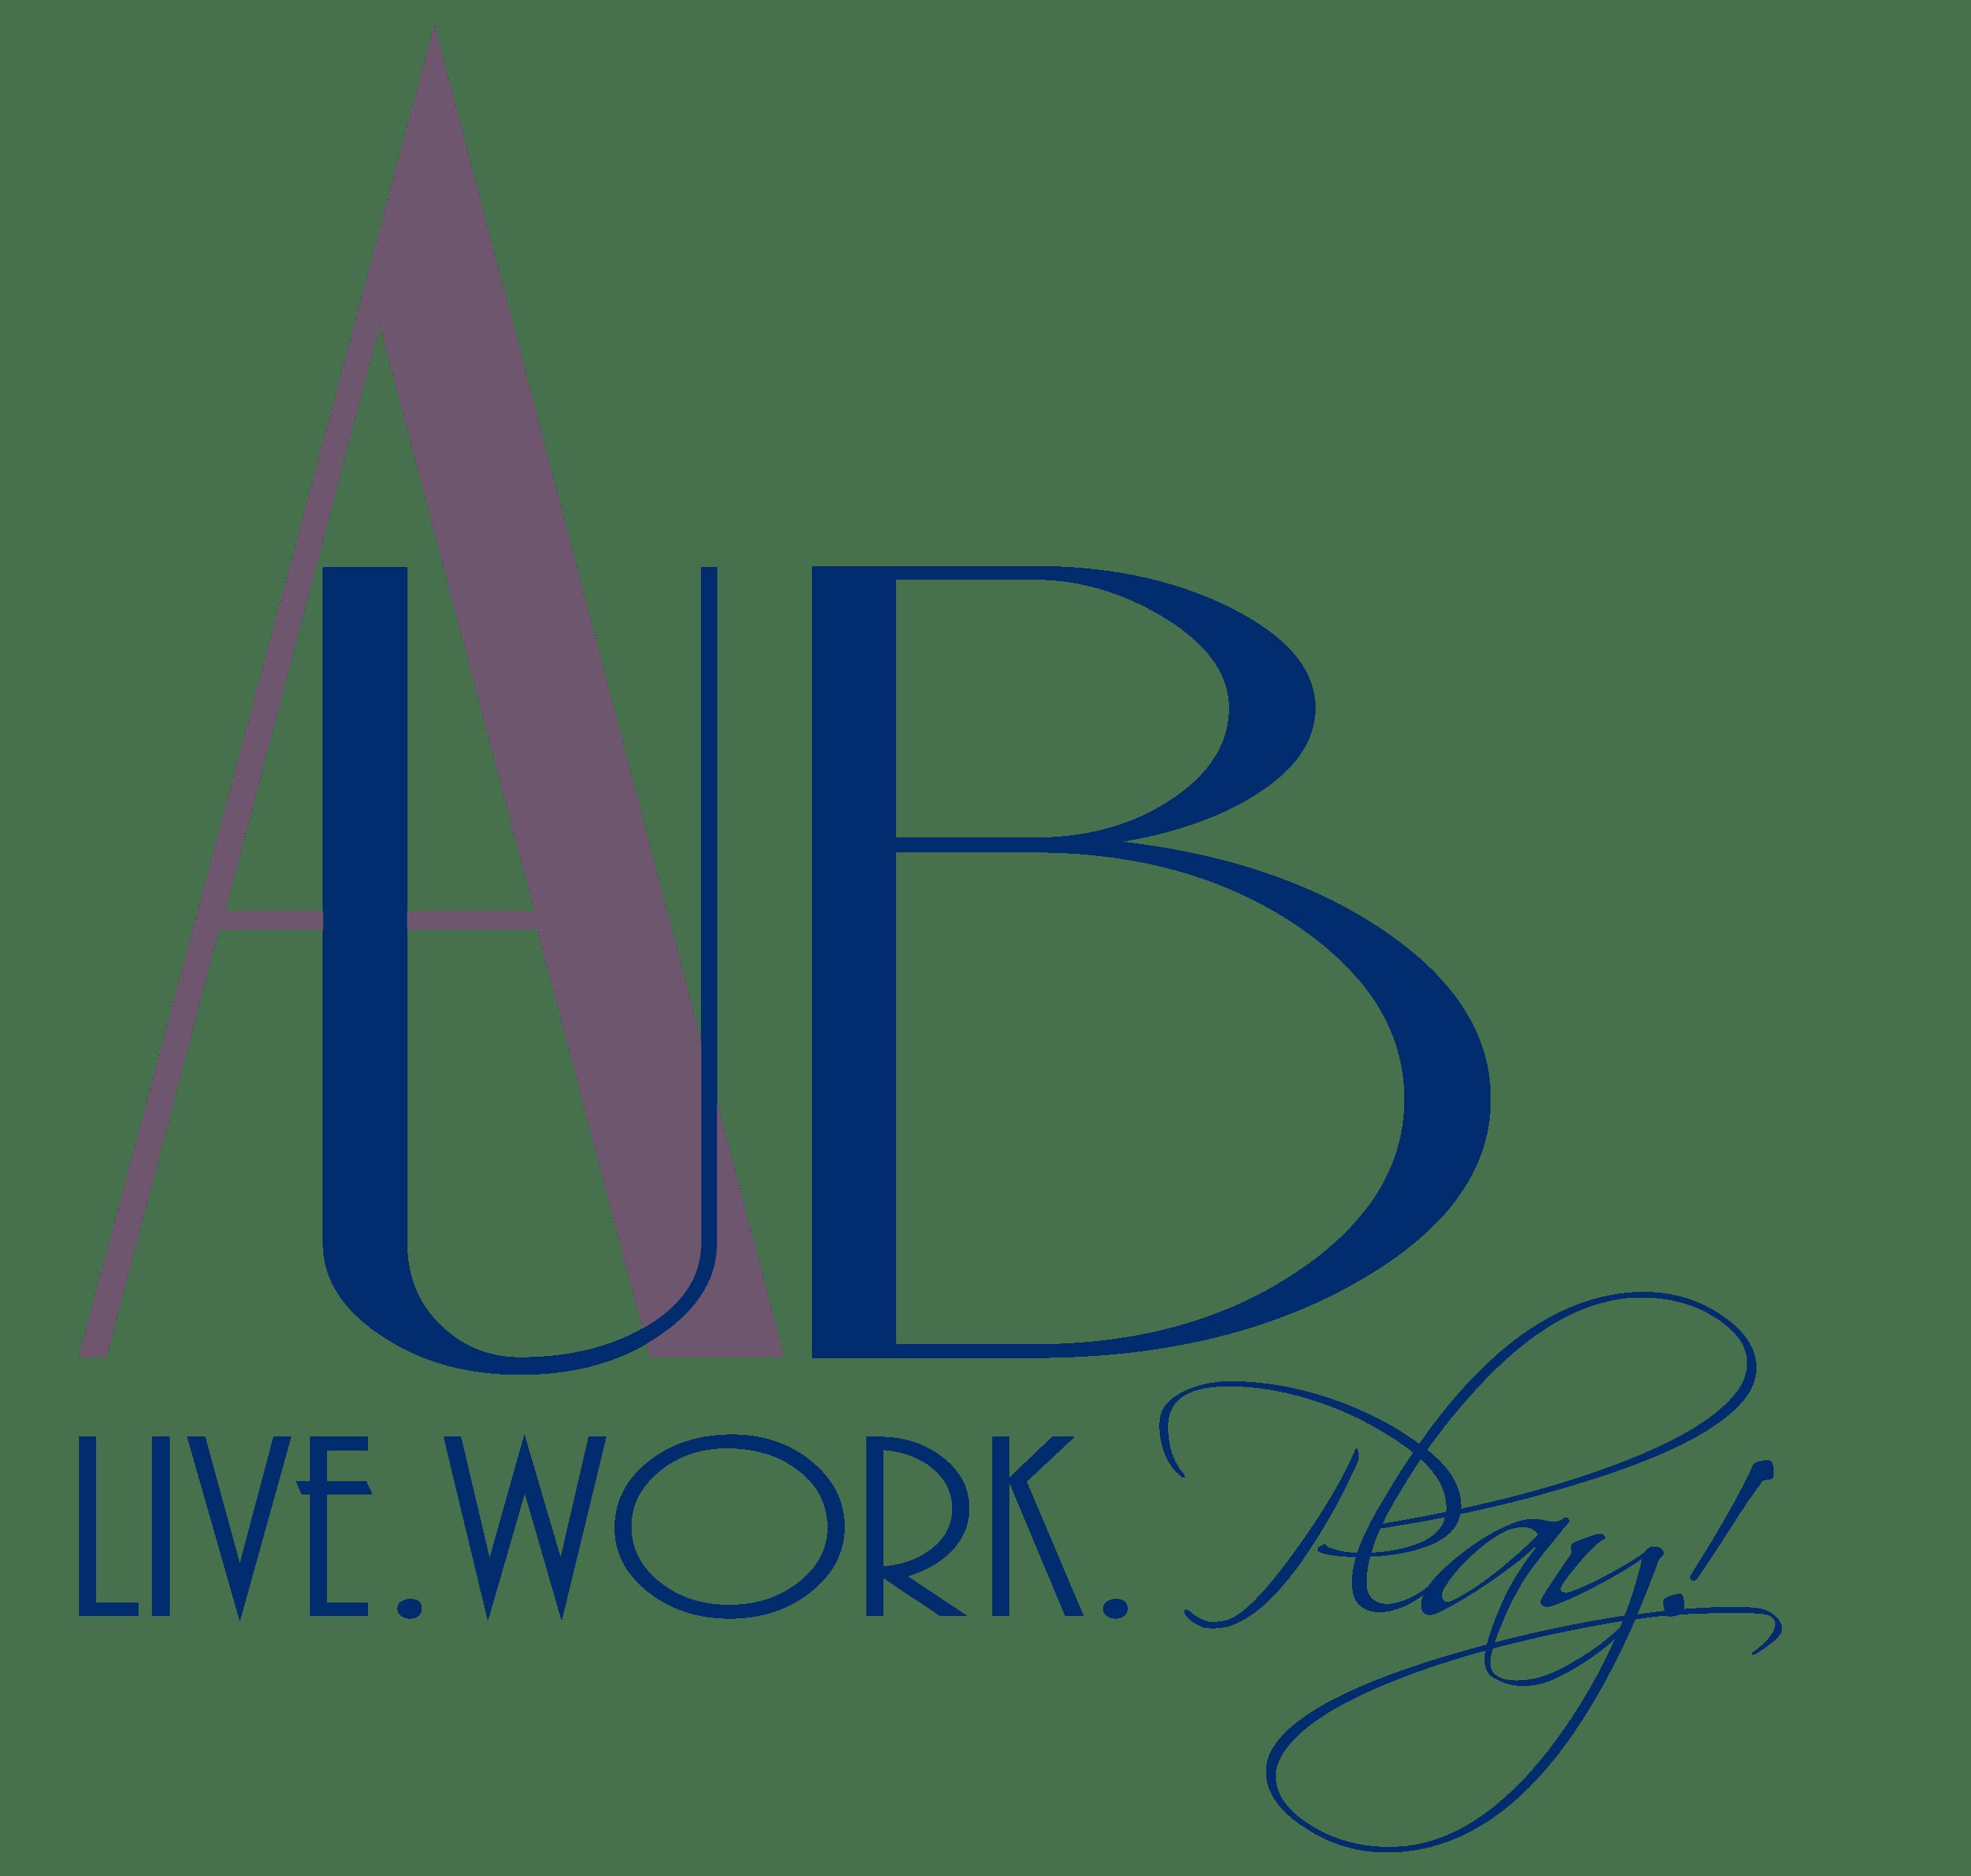 The Addison Universal Blvd AUB Live Work Play